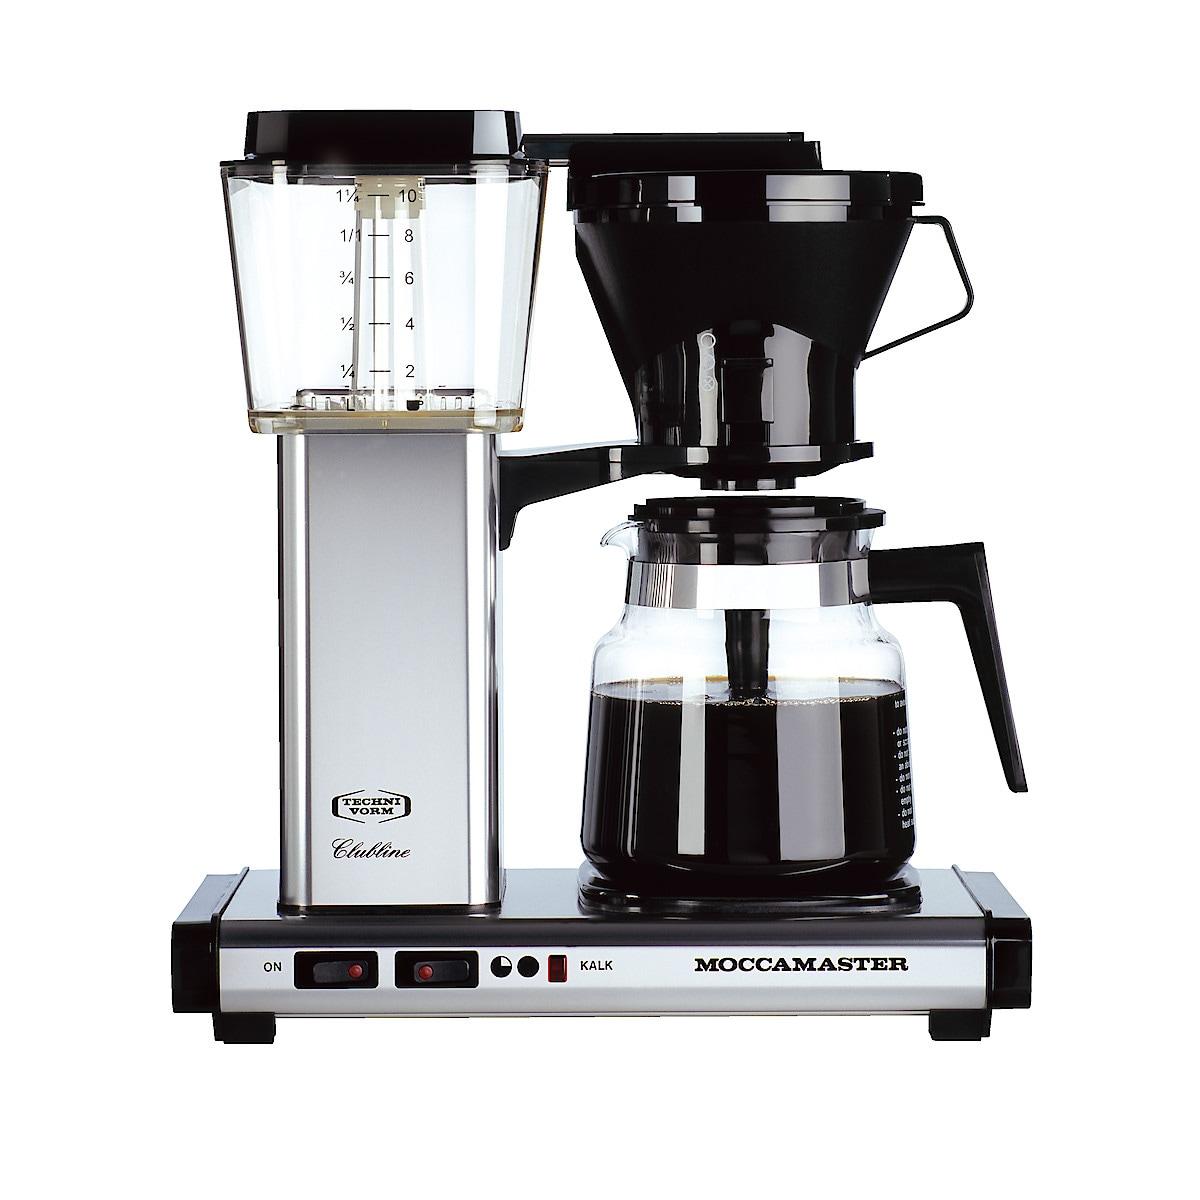 Kaffebryggare Moccamaster KBC 741